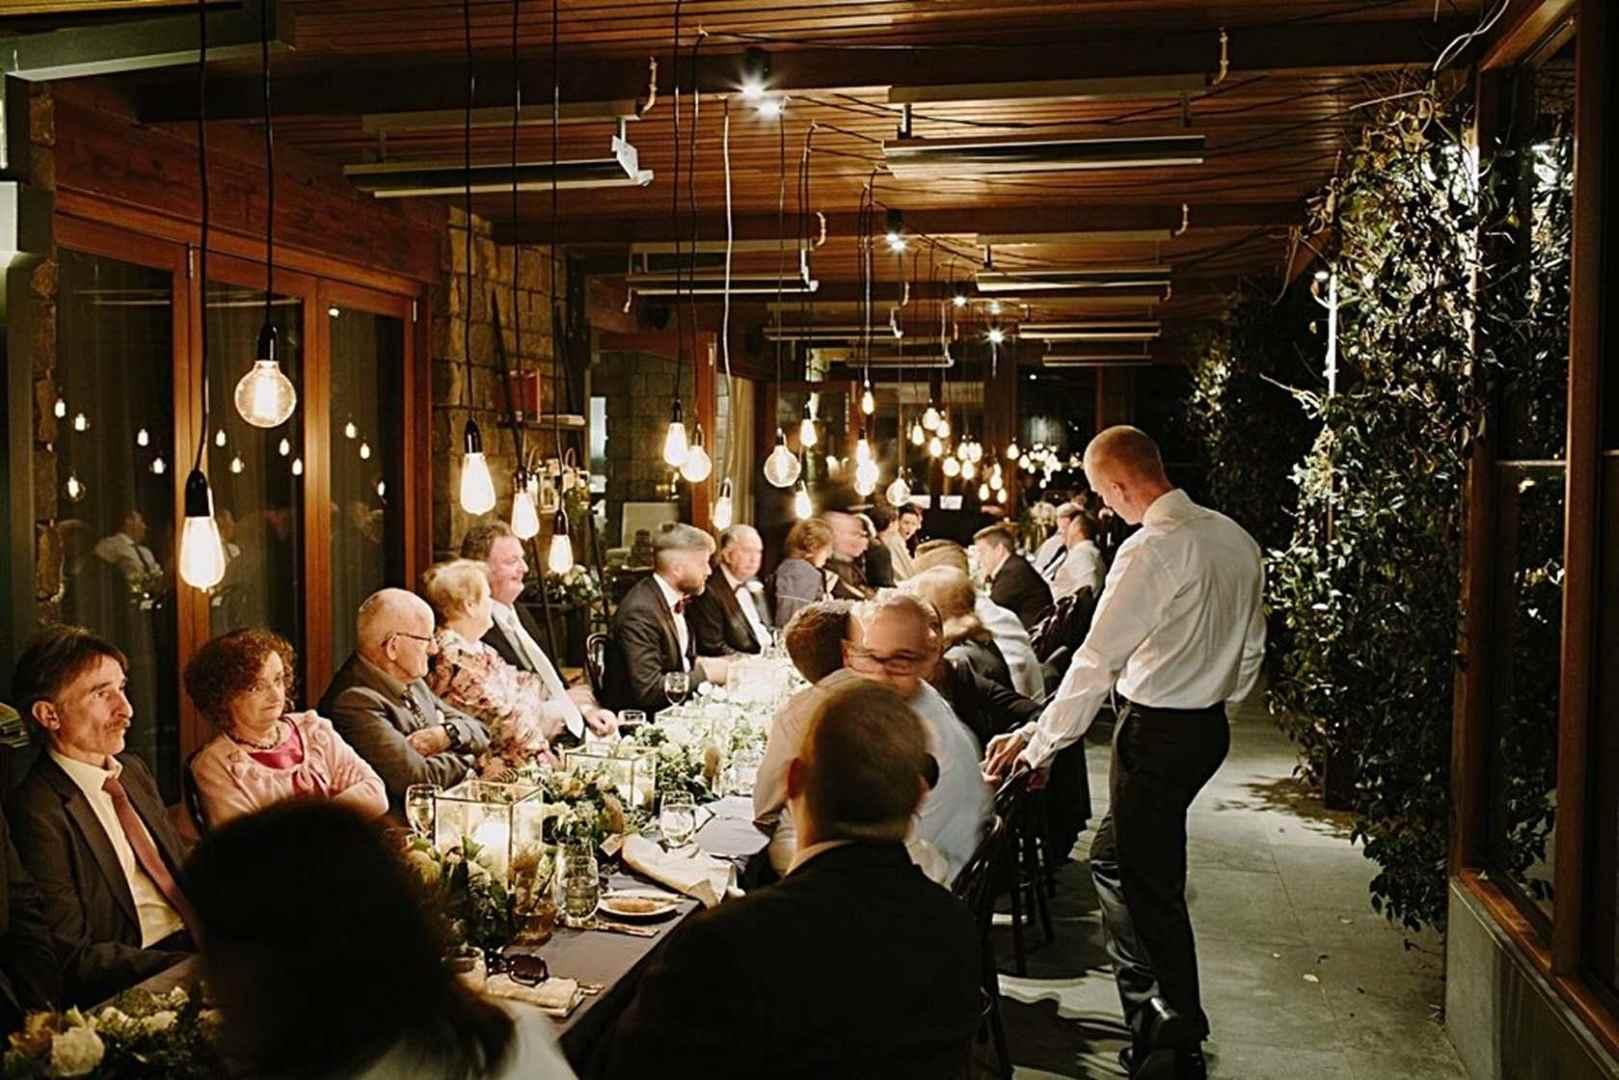 Wedding Venue - Spicers Peak Lodge - The Terrace 3 on Veilability